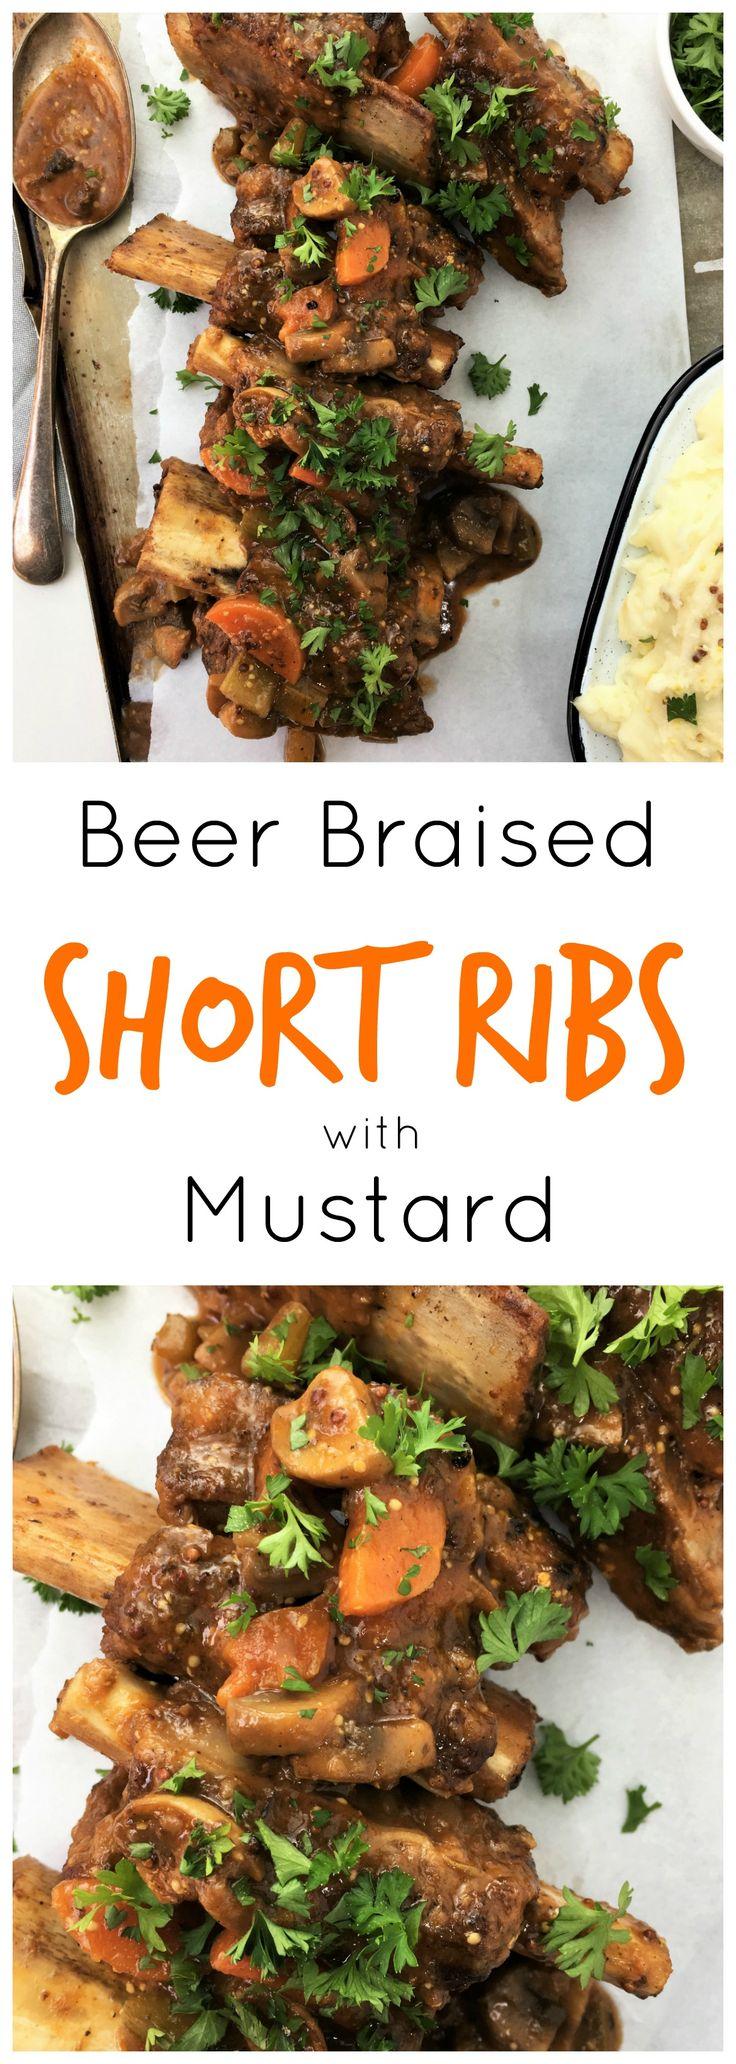 Beer braised short ribs with mustard - deep roasted vegetable packed sauce